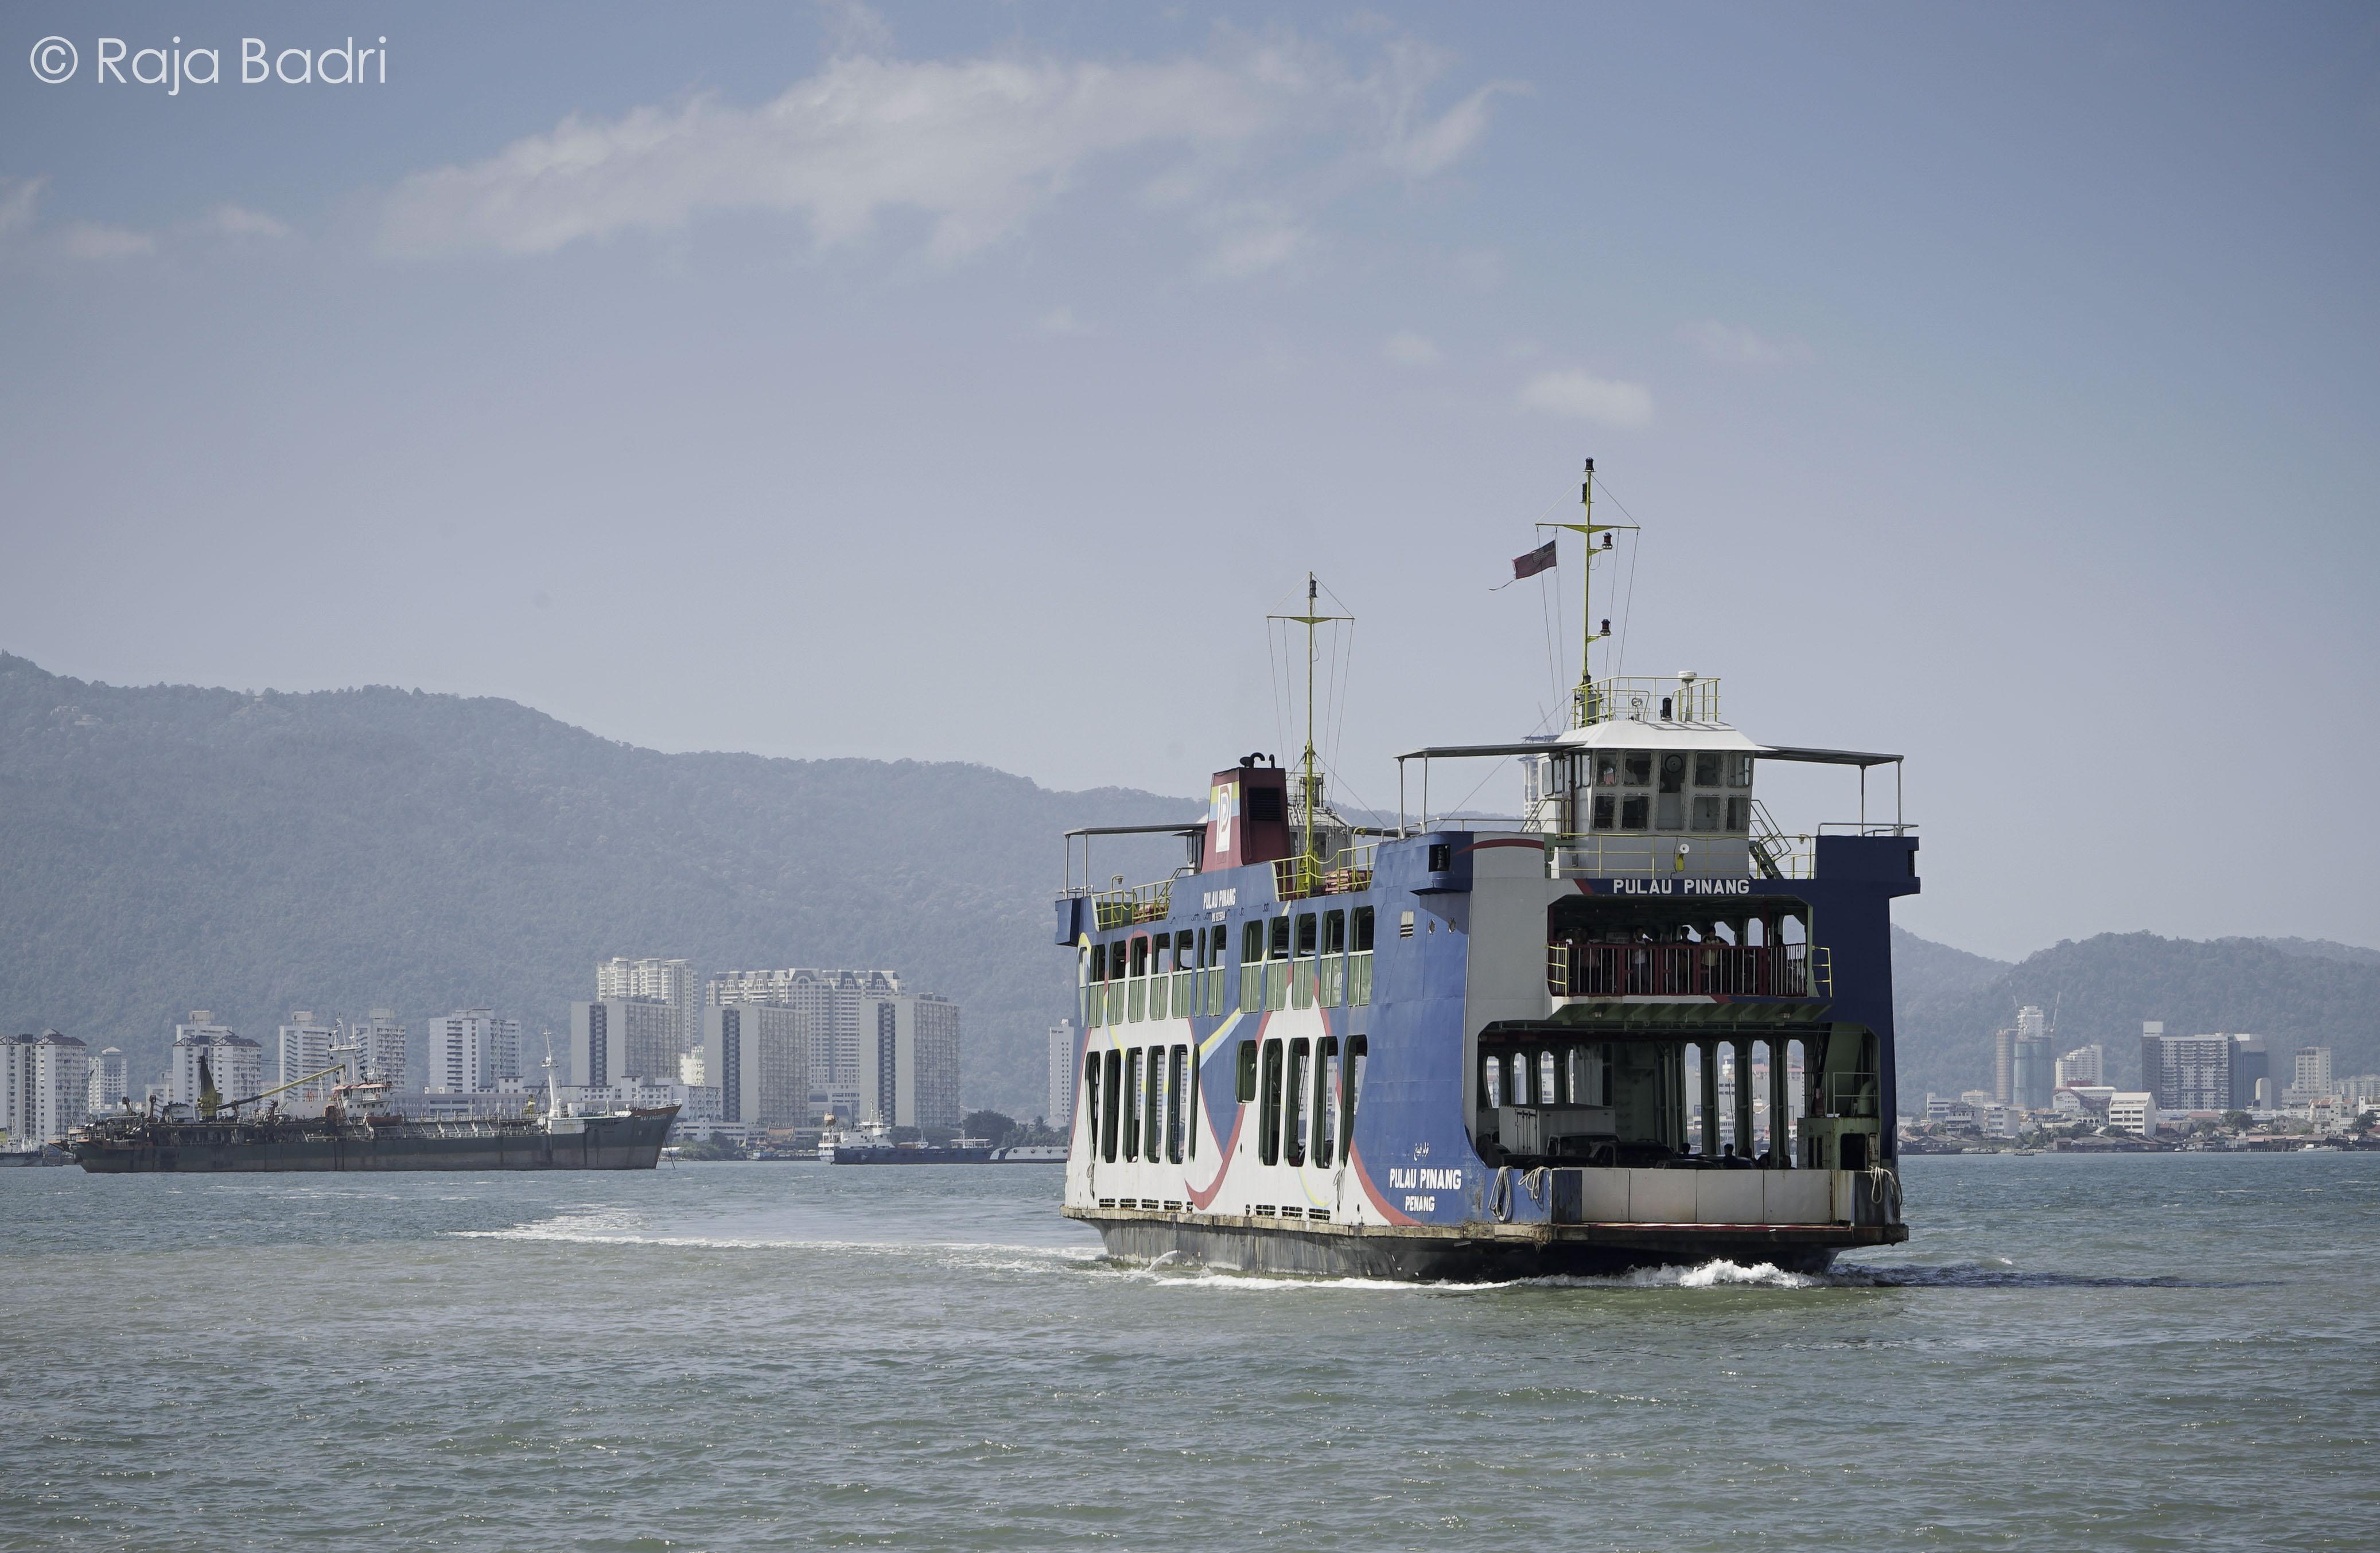 penang ferry 6